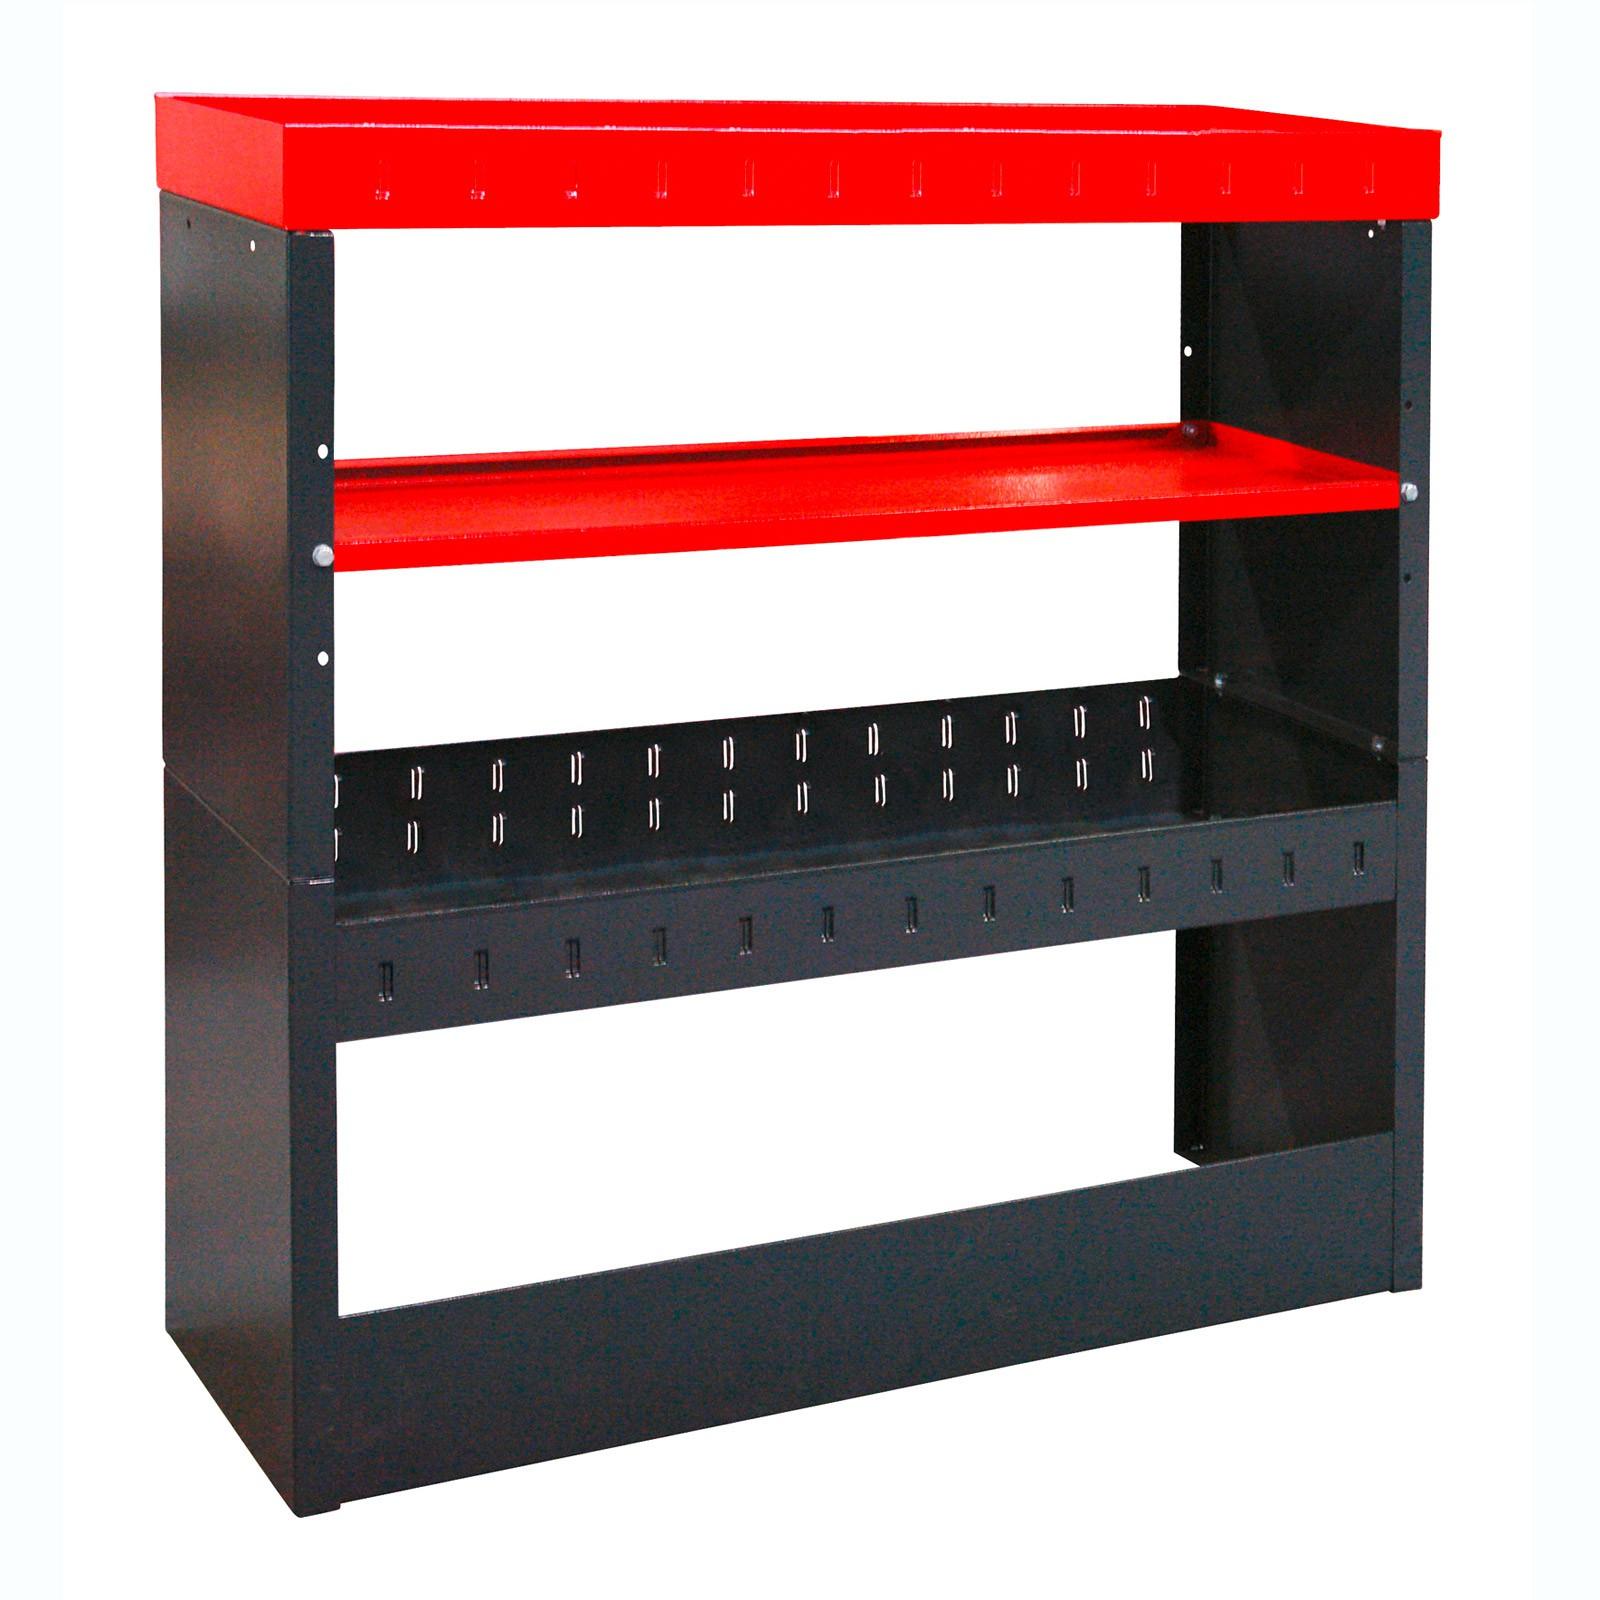 fahrzeugeinrichtung fahrzeugregal stahl kfz. Black Bedroom Furniture Sets. Home Design Ideas